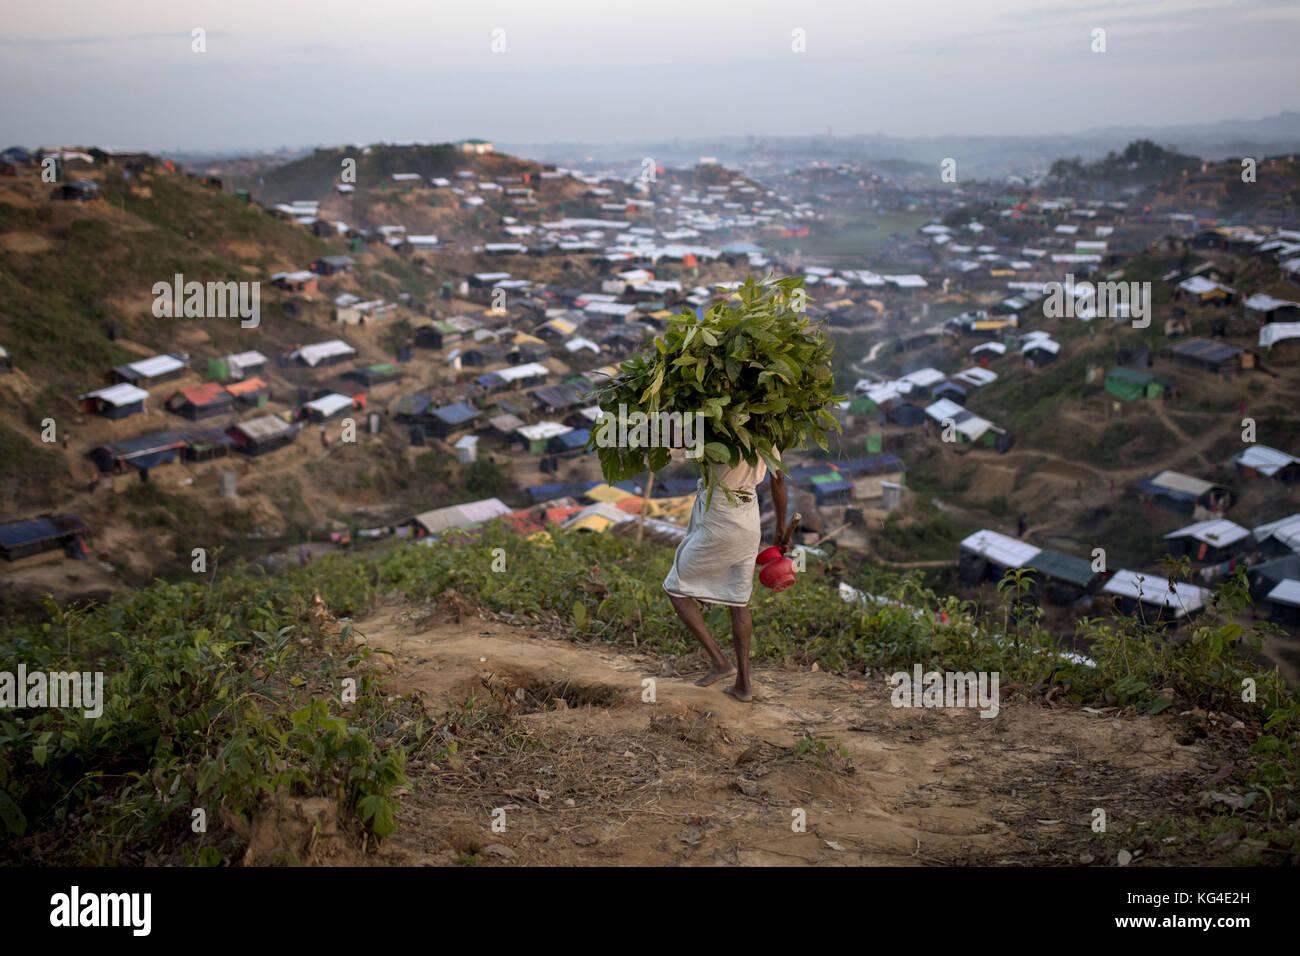 "November 3, 2017 - November 03, 2017 Cox's Bazar, Bangladesh ''"" Rohingya refugee man at Thankhali refugee - Stock Image"